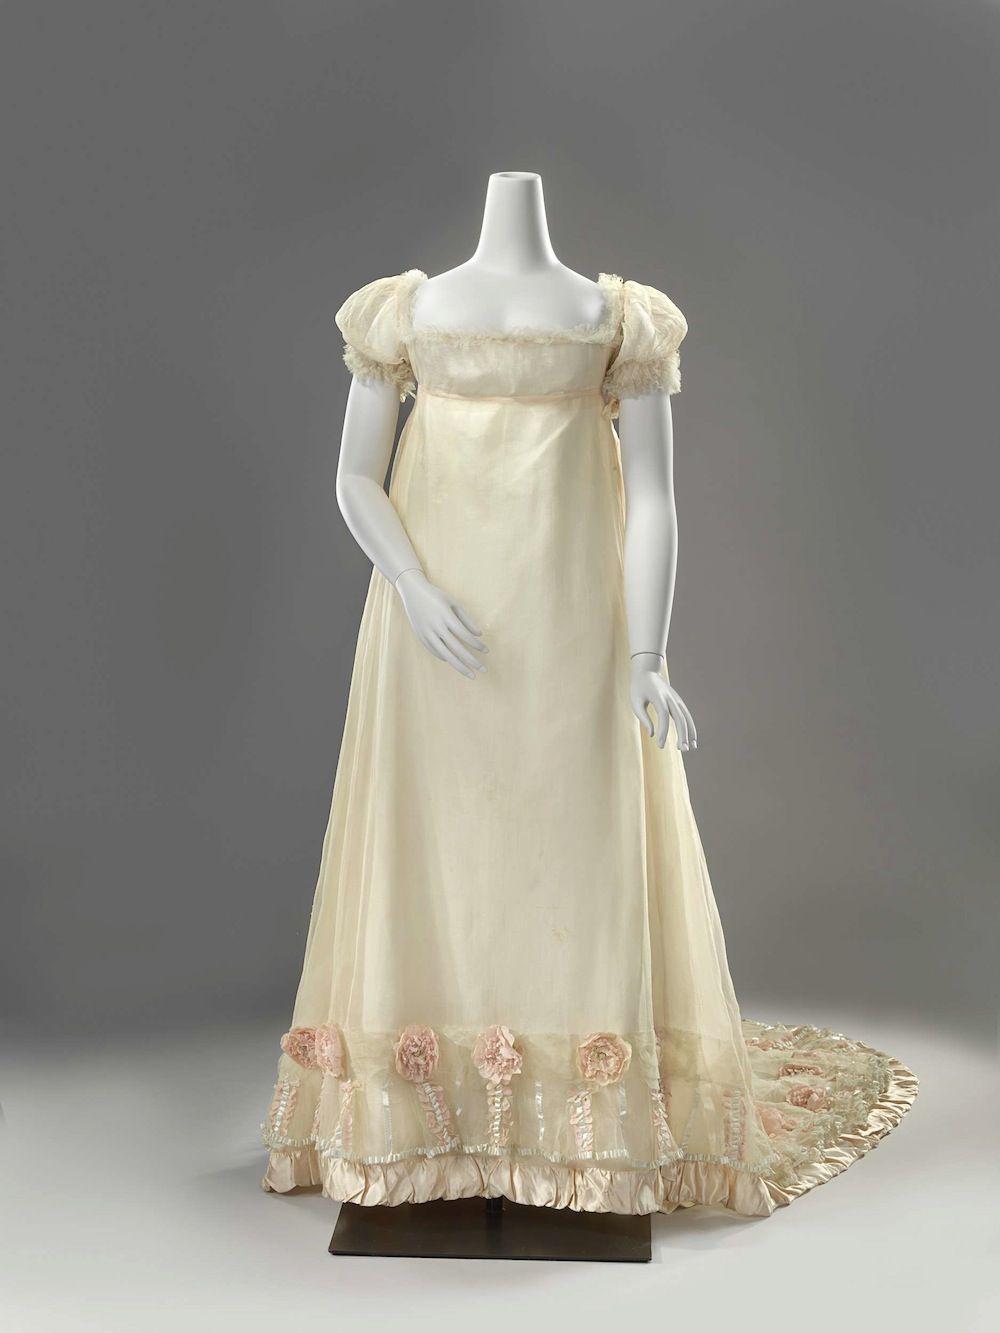 Cream colored vintage wedding dresses  Wedding dress  From the Rijskmuseum  swinging edtorian